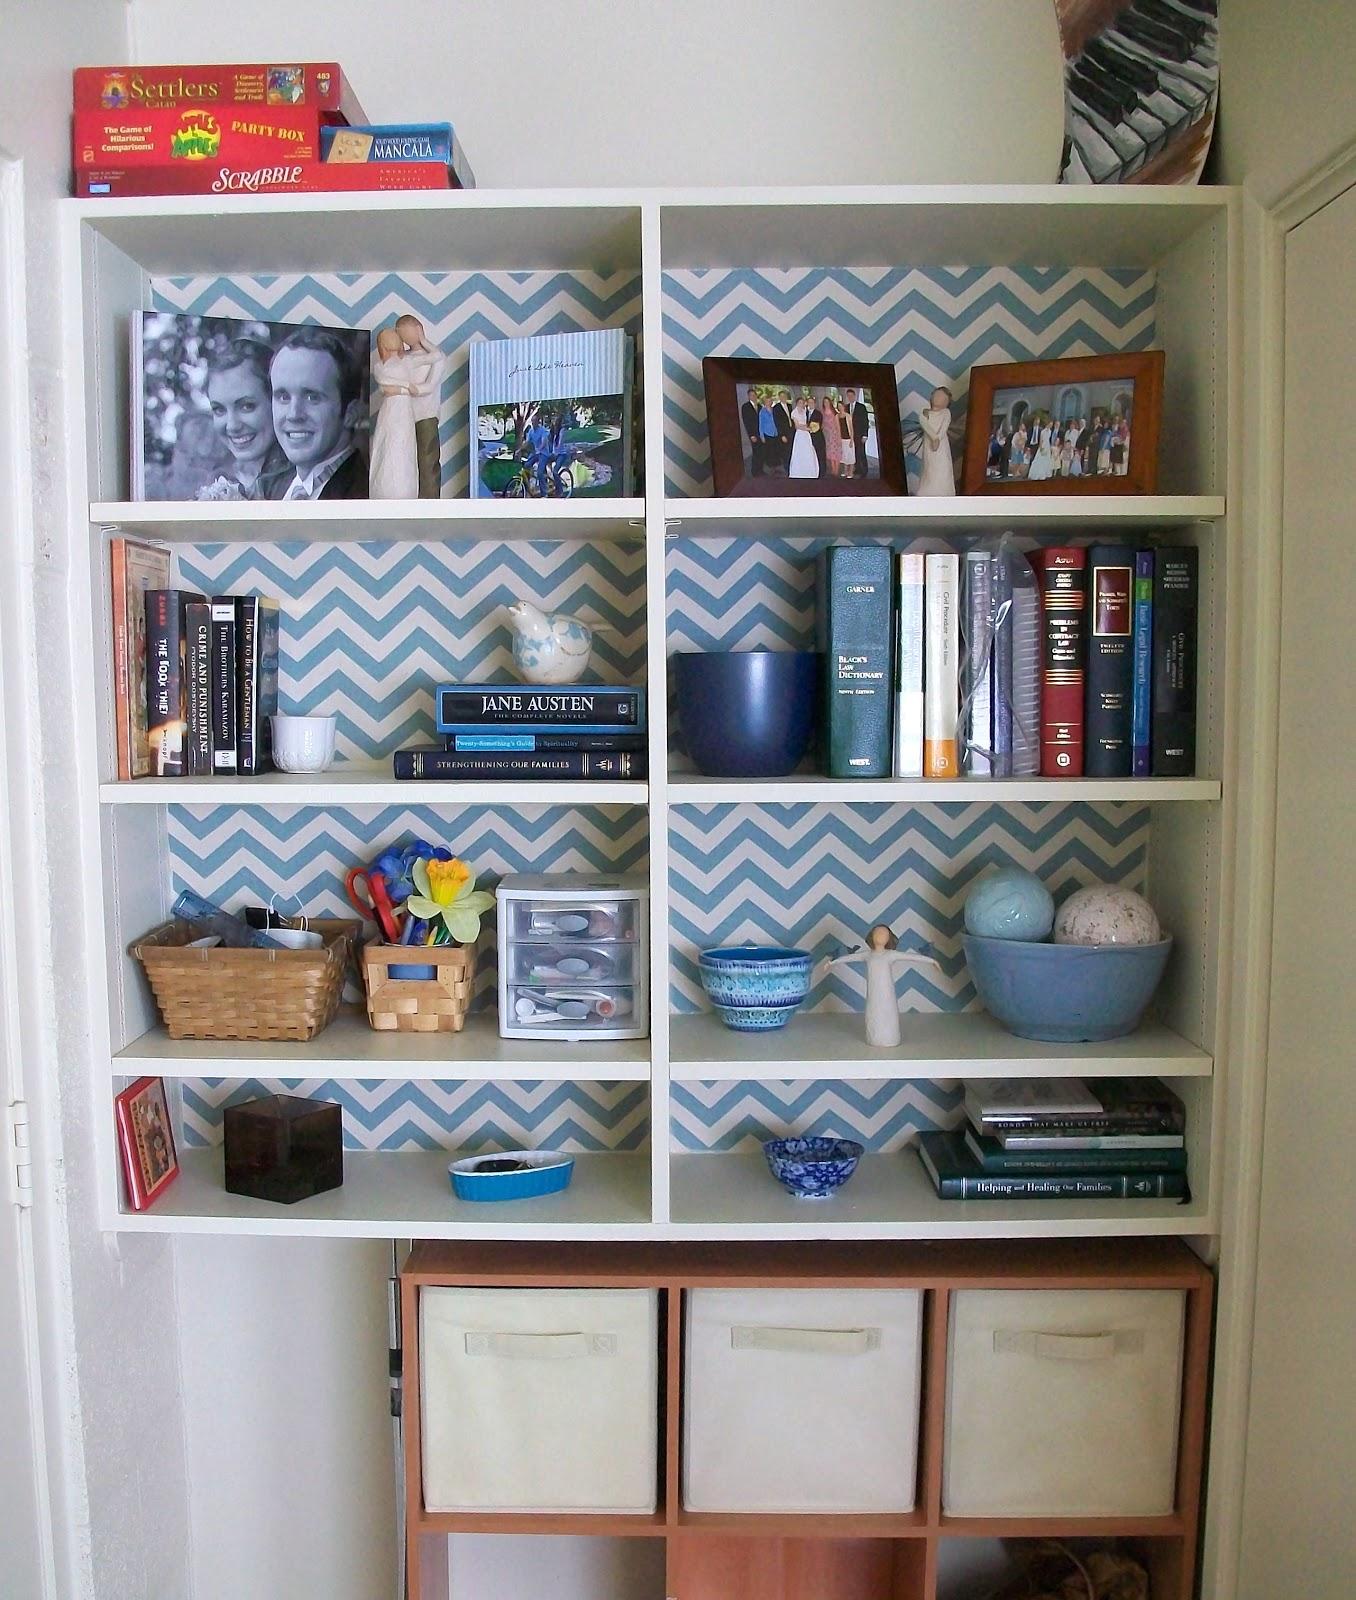 Temporary Fabric Wallpaper Tutorial • Heather Handmade